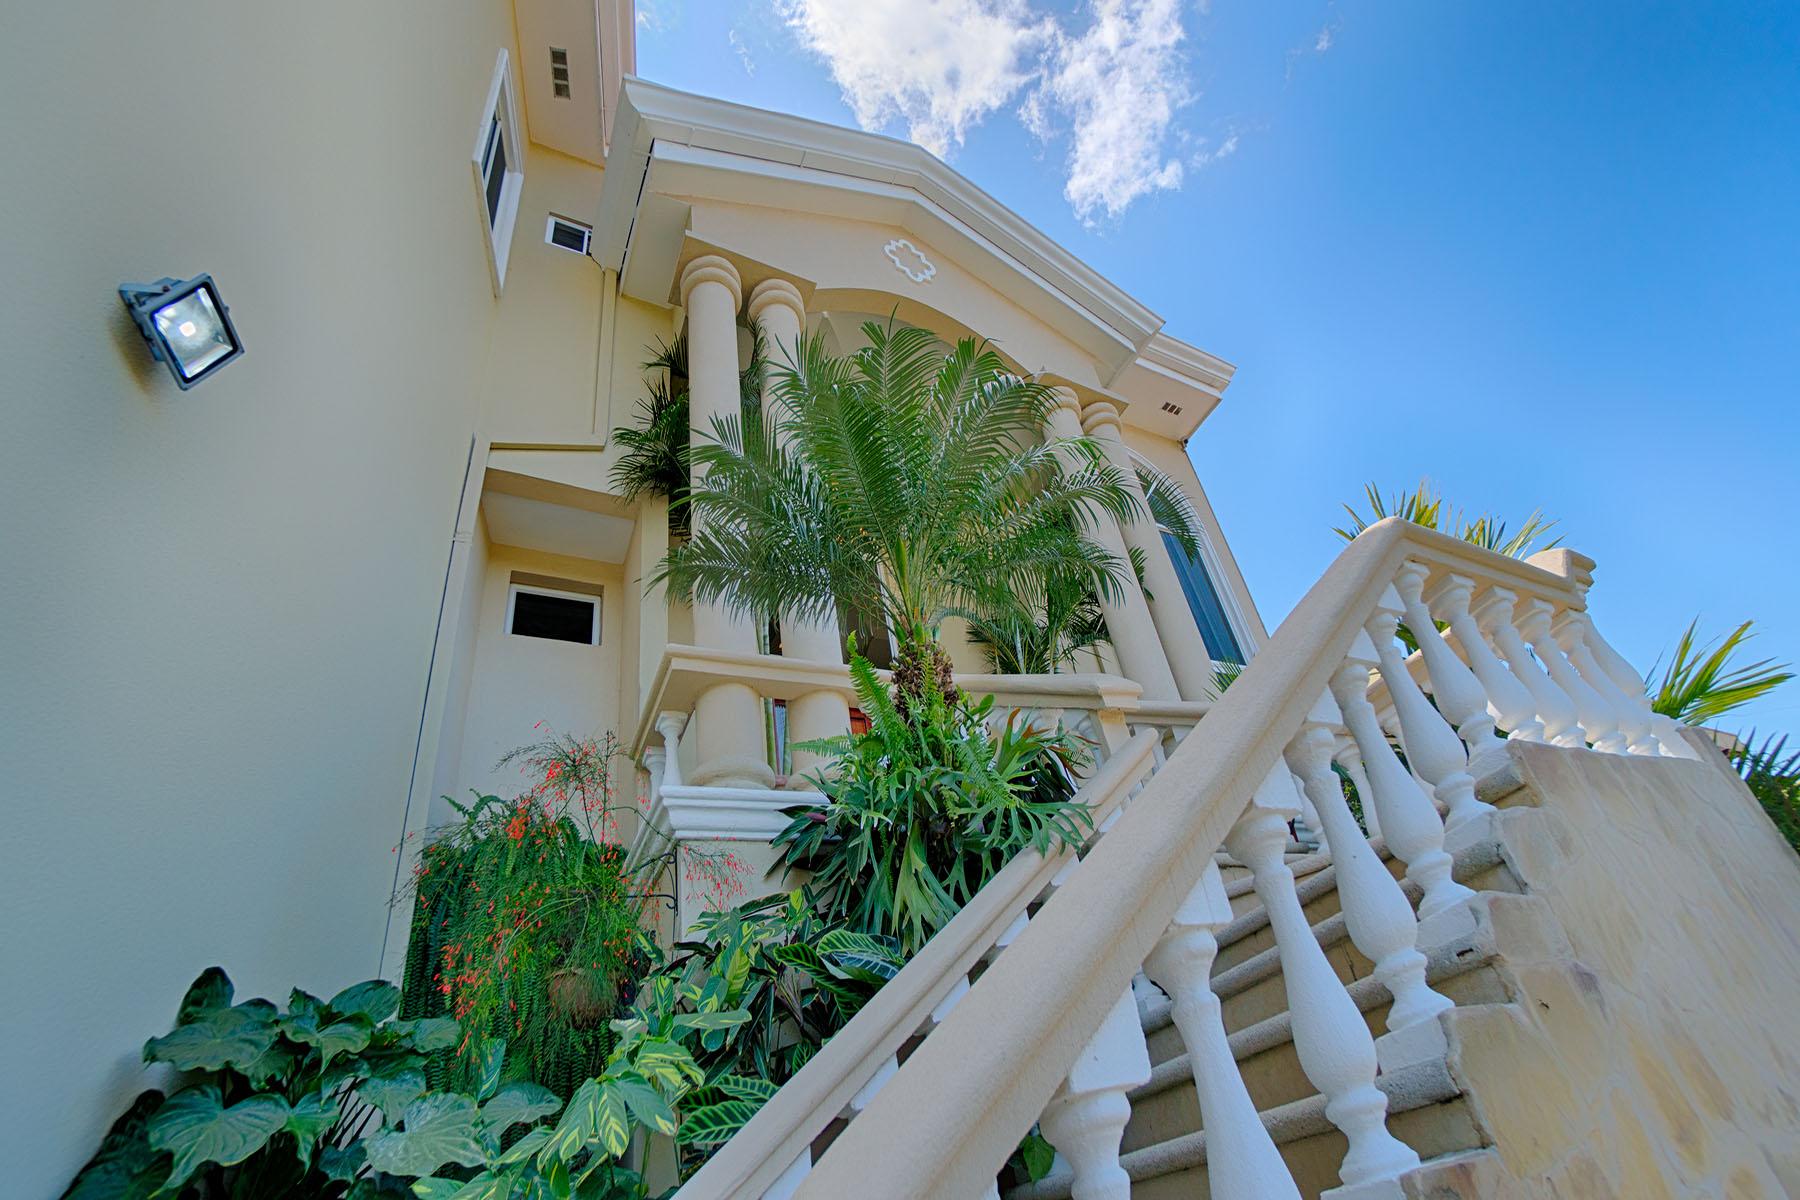 Additional photo for property listing at Ciudad Cariari de Belén Belen, Heredia Costa Rica